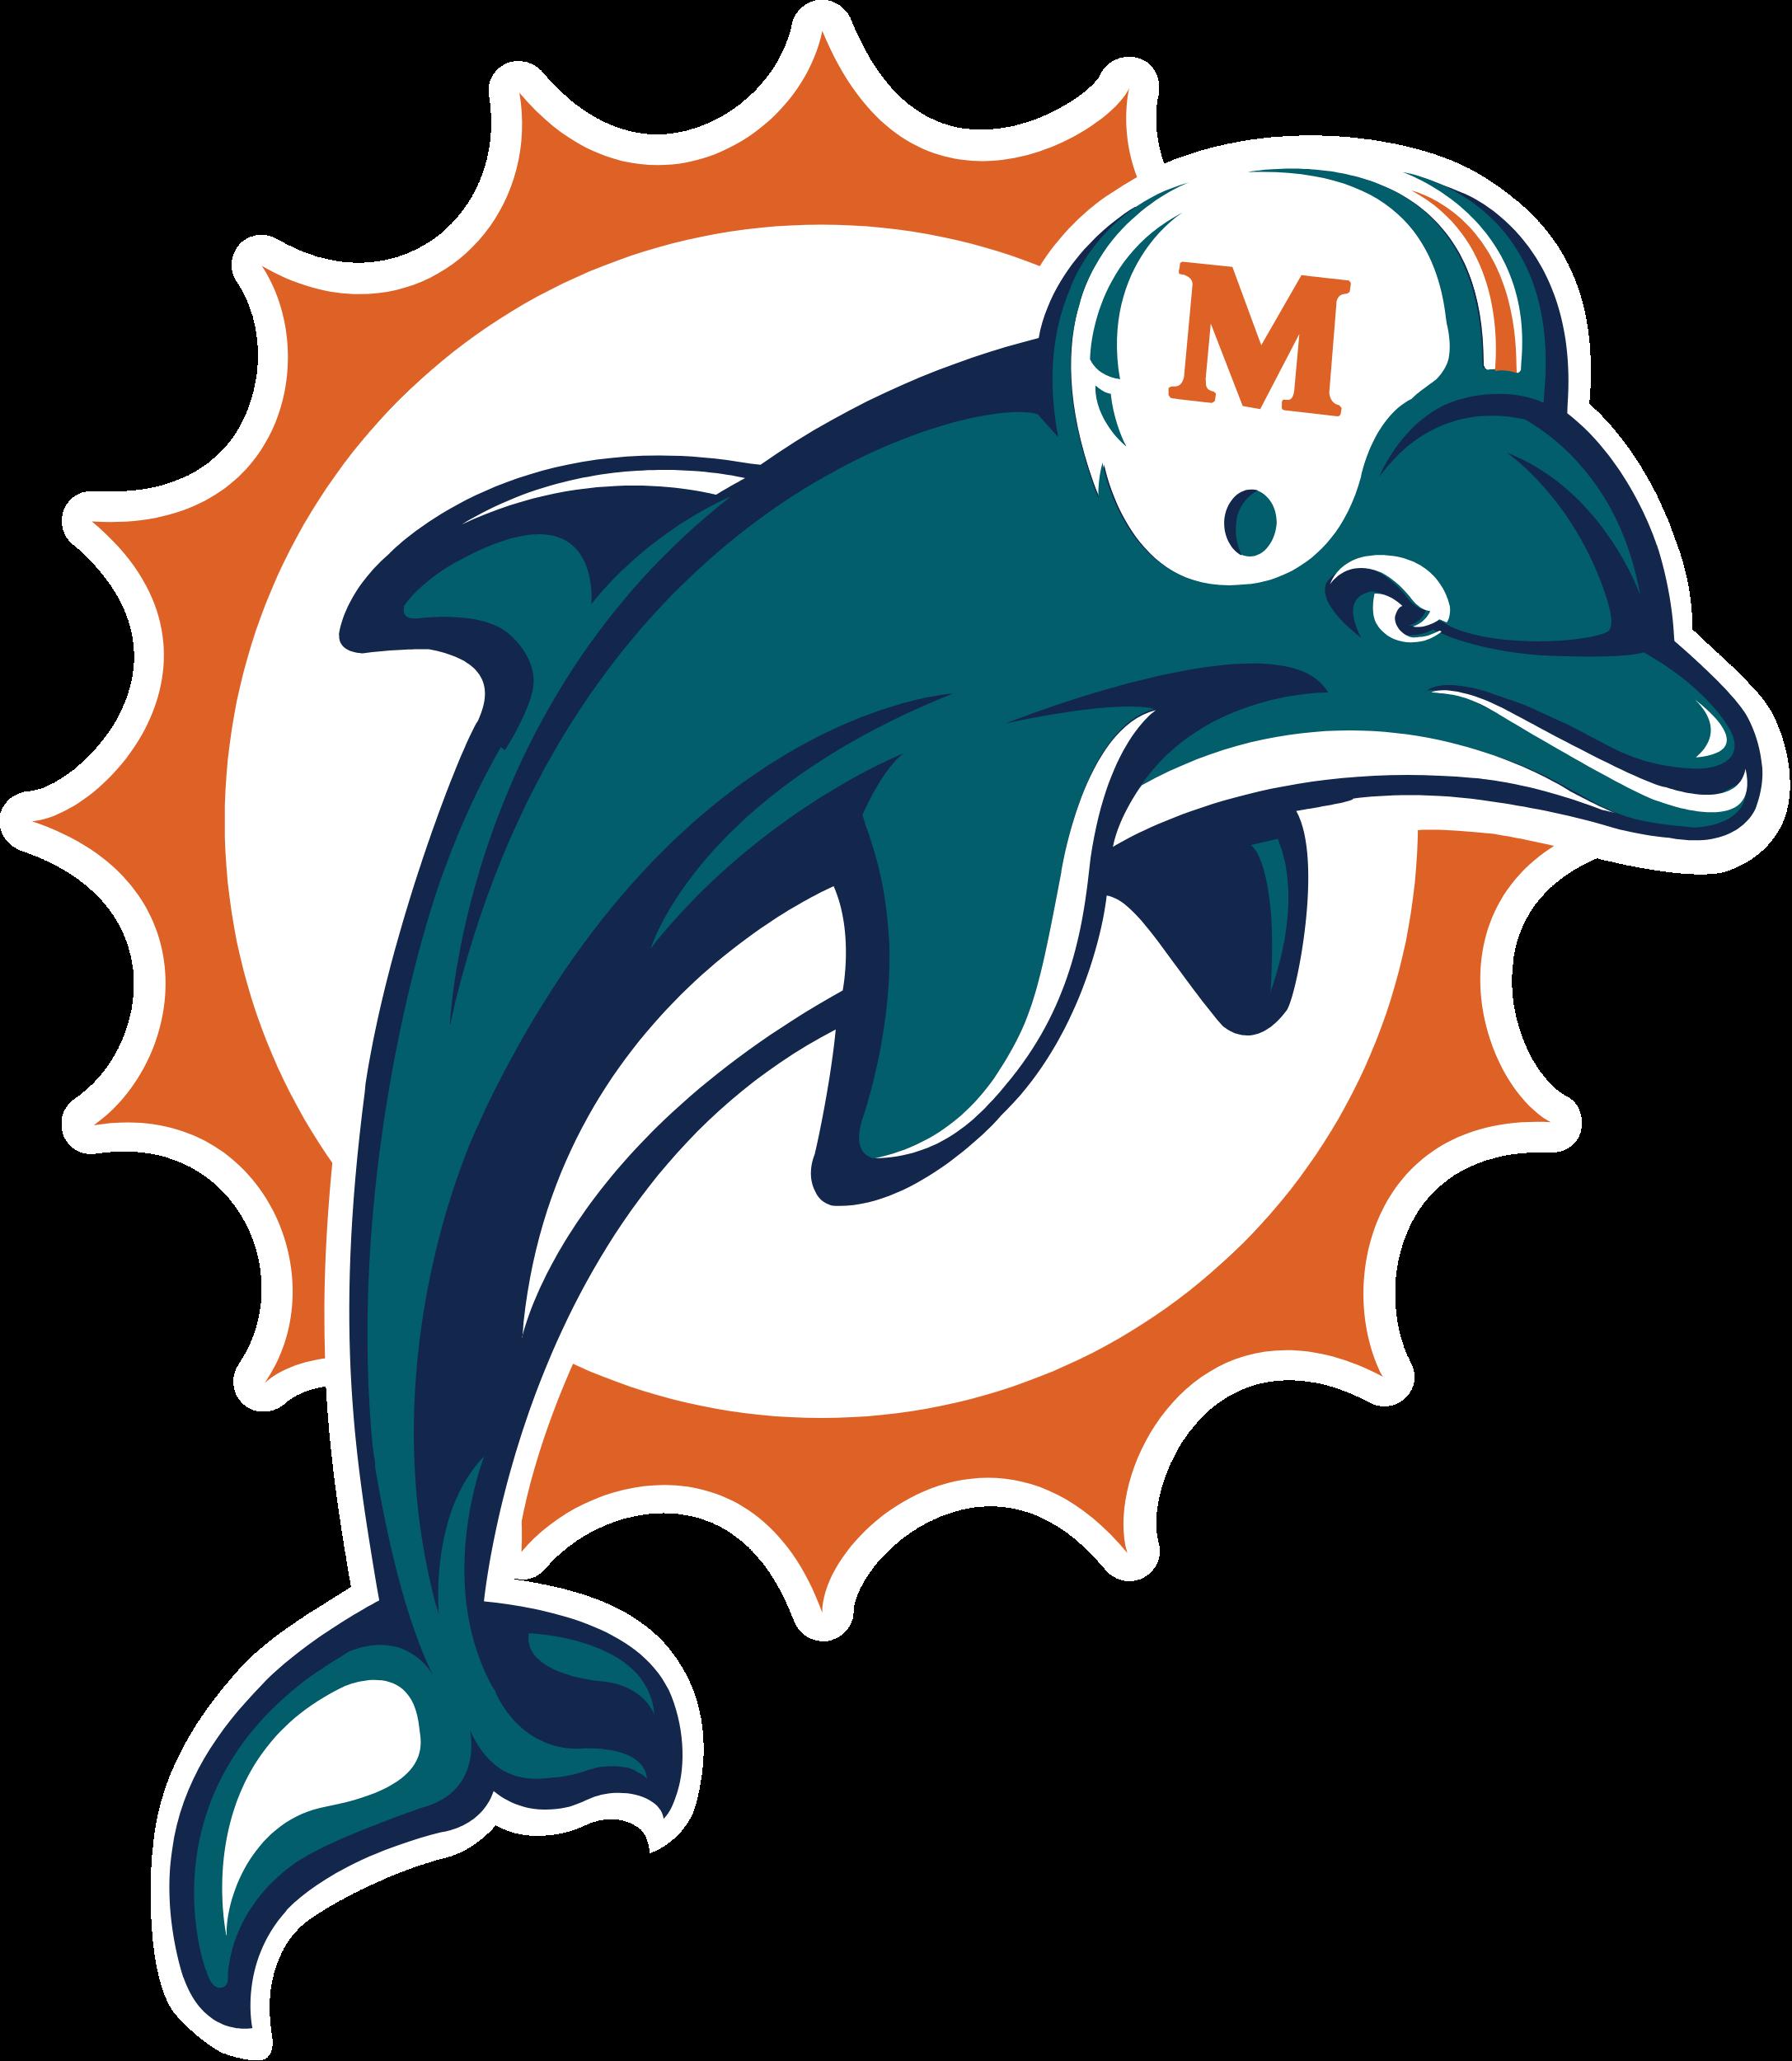 Clipart dolphin dolphin miami logo. Dolphins logos download